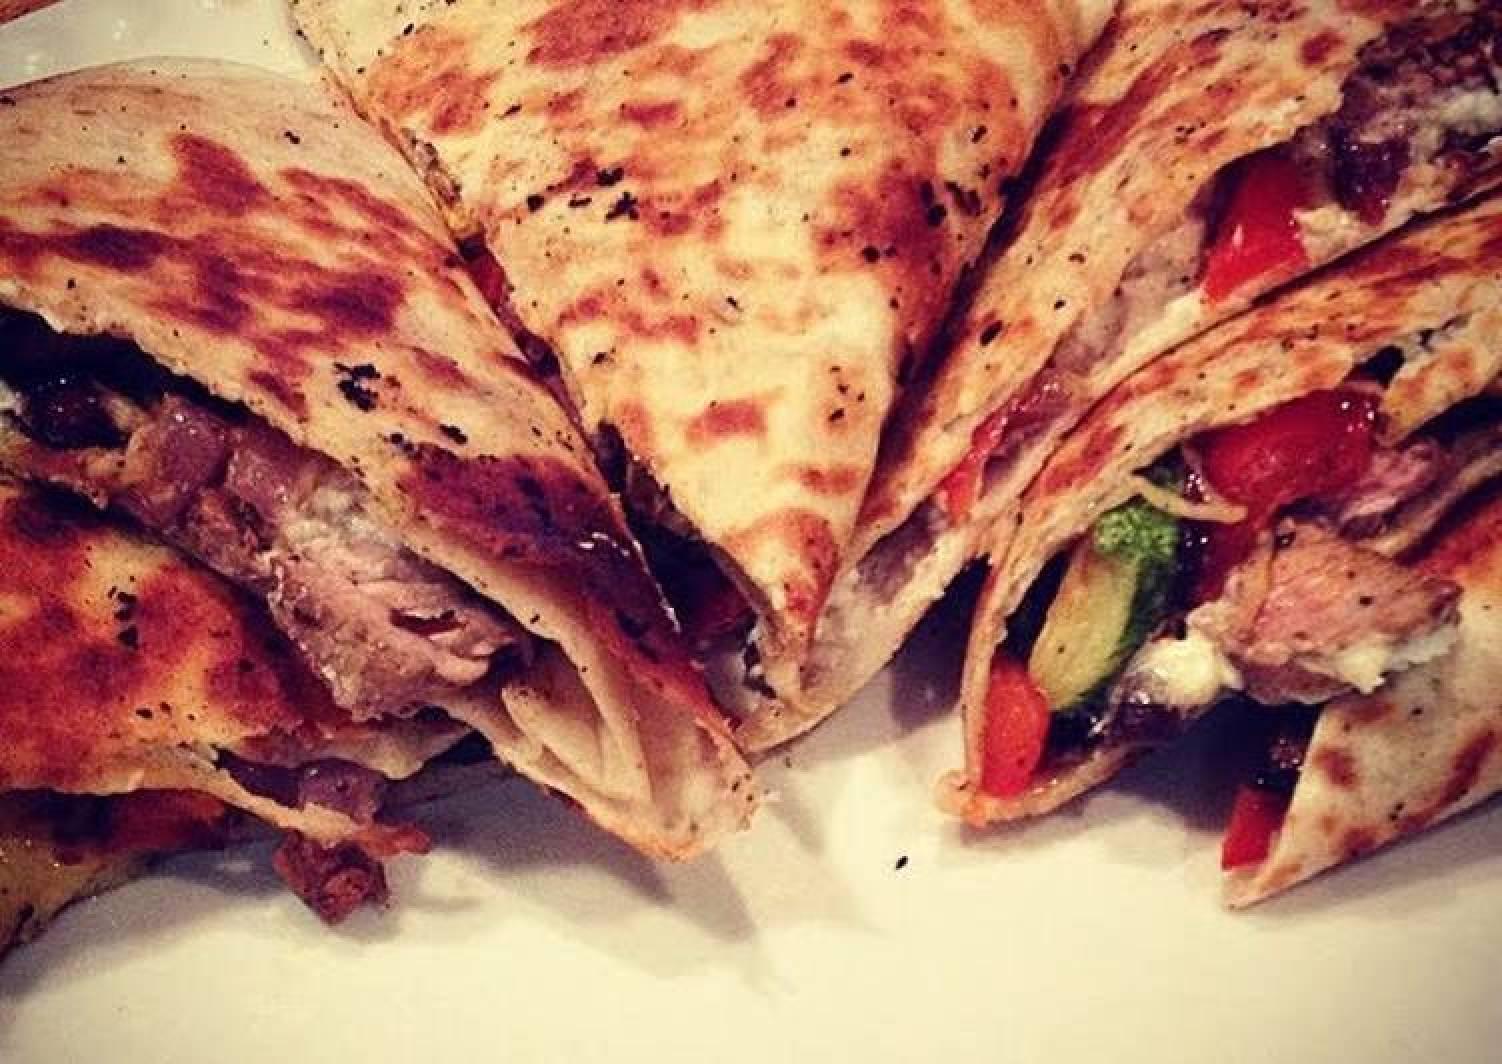 Roasted Veggie & Balsamic Steak Quesadillas